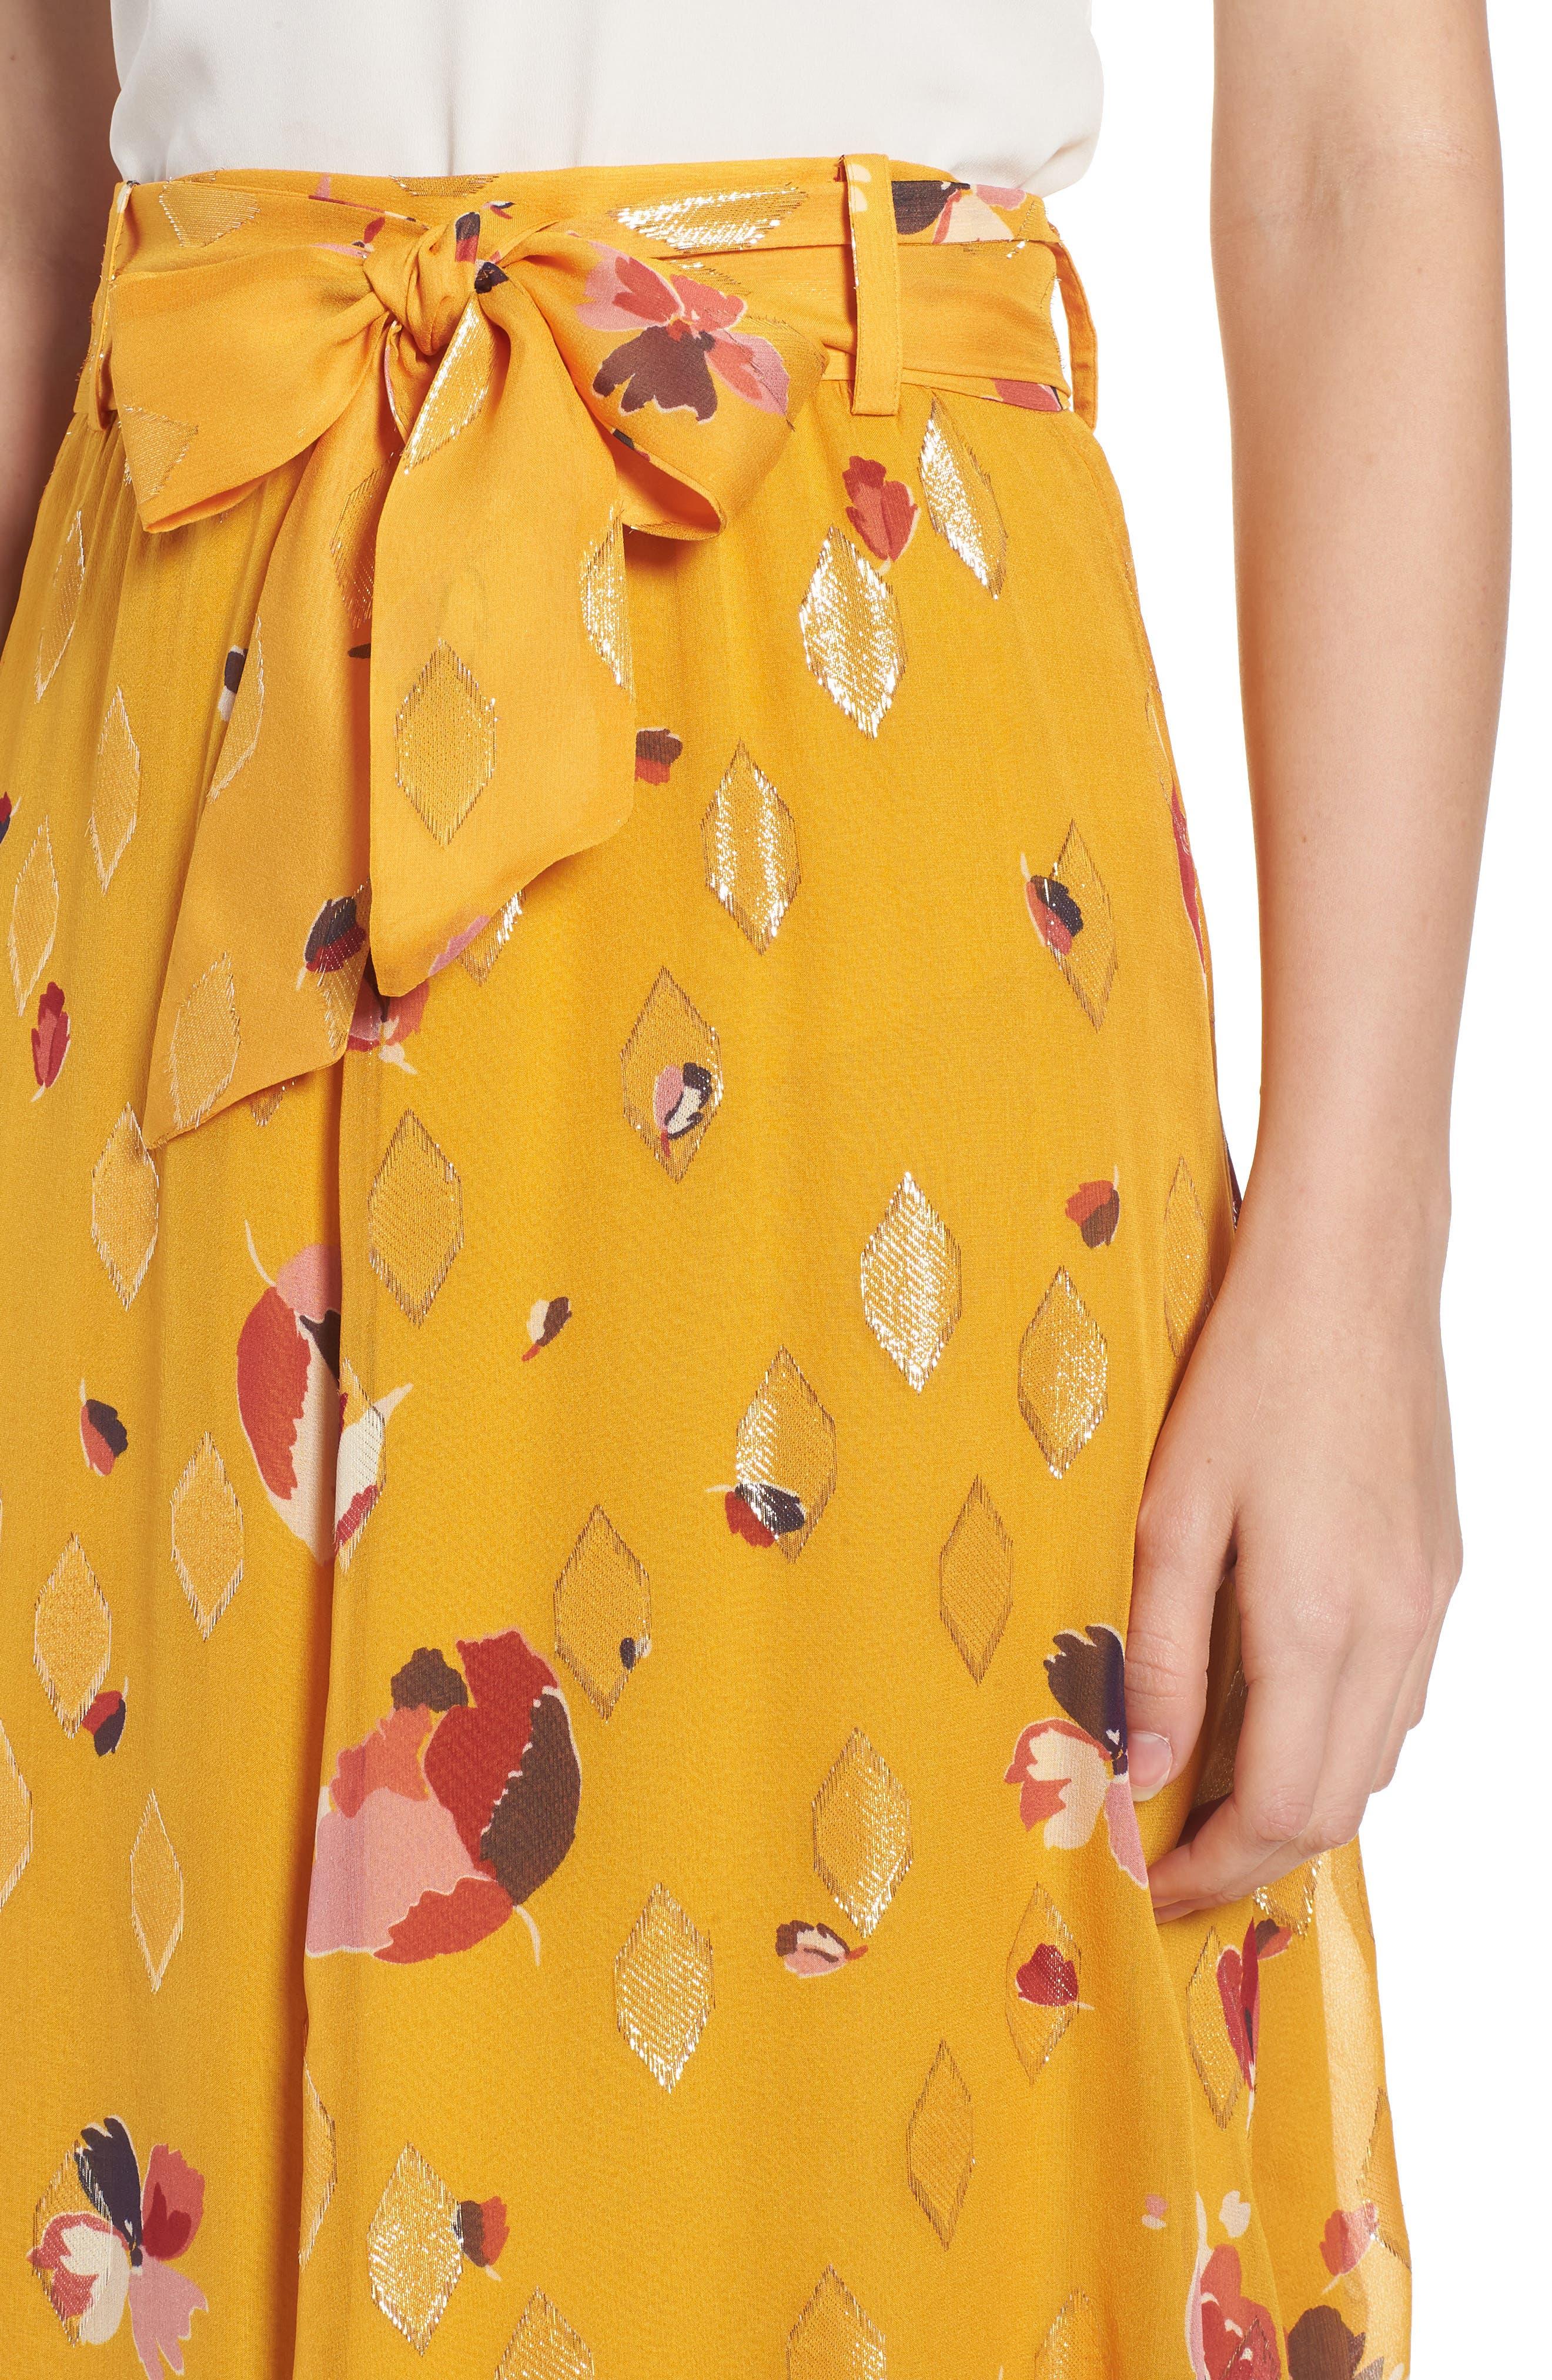 Arizona Floral & Metallic Silk Blend Skirt,                             Alternate thumbnail 5, color,                             Big Flowers 60S On Saffron